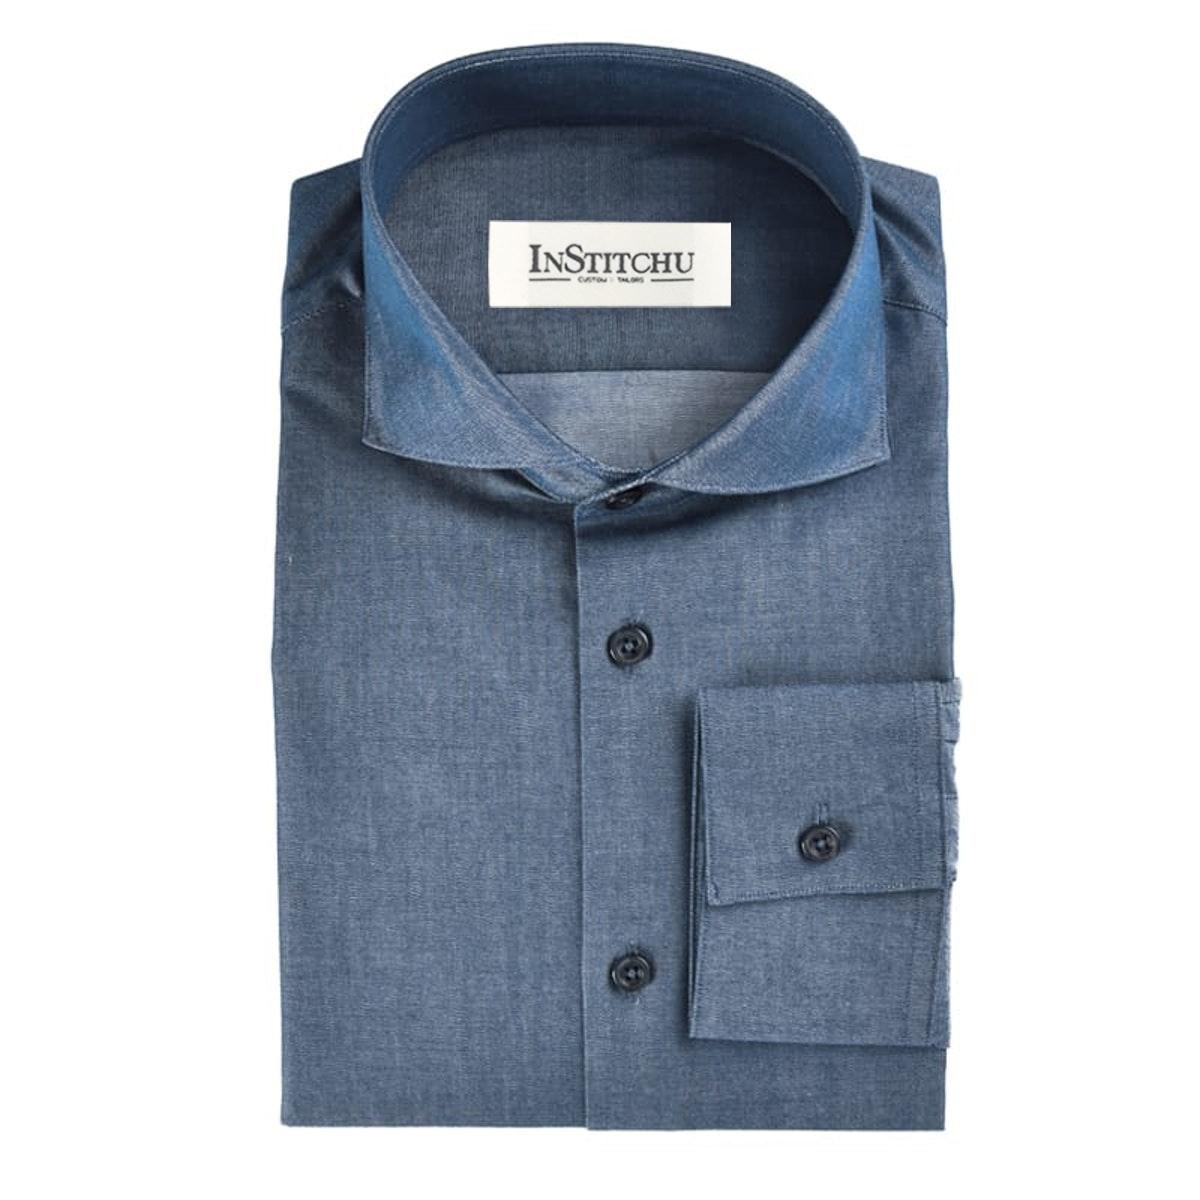 InStitchu Collection The Tarcoola Blue Chambray Shirt